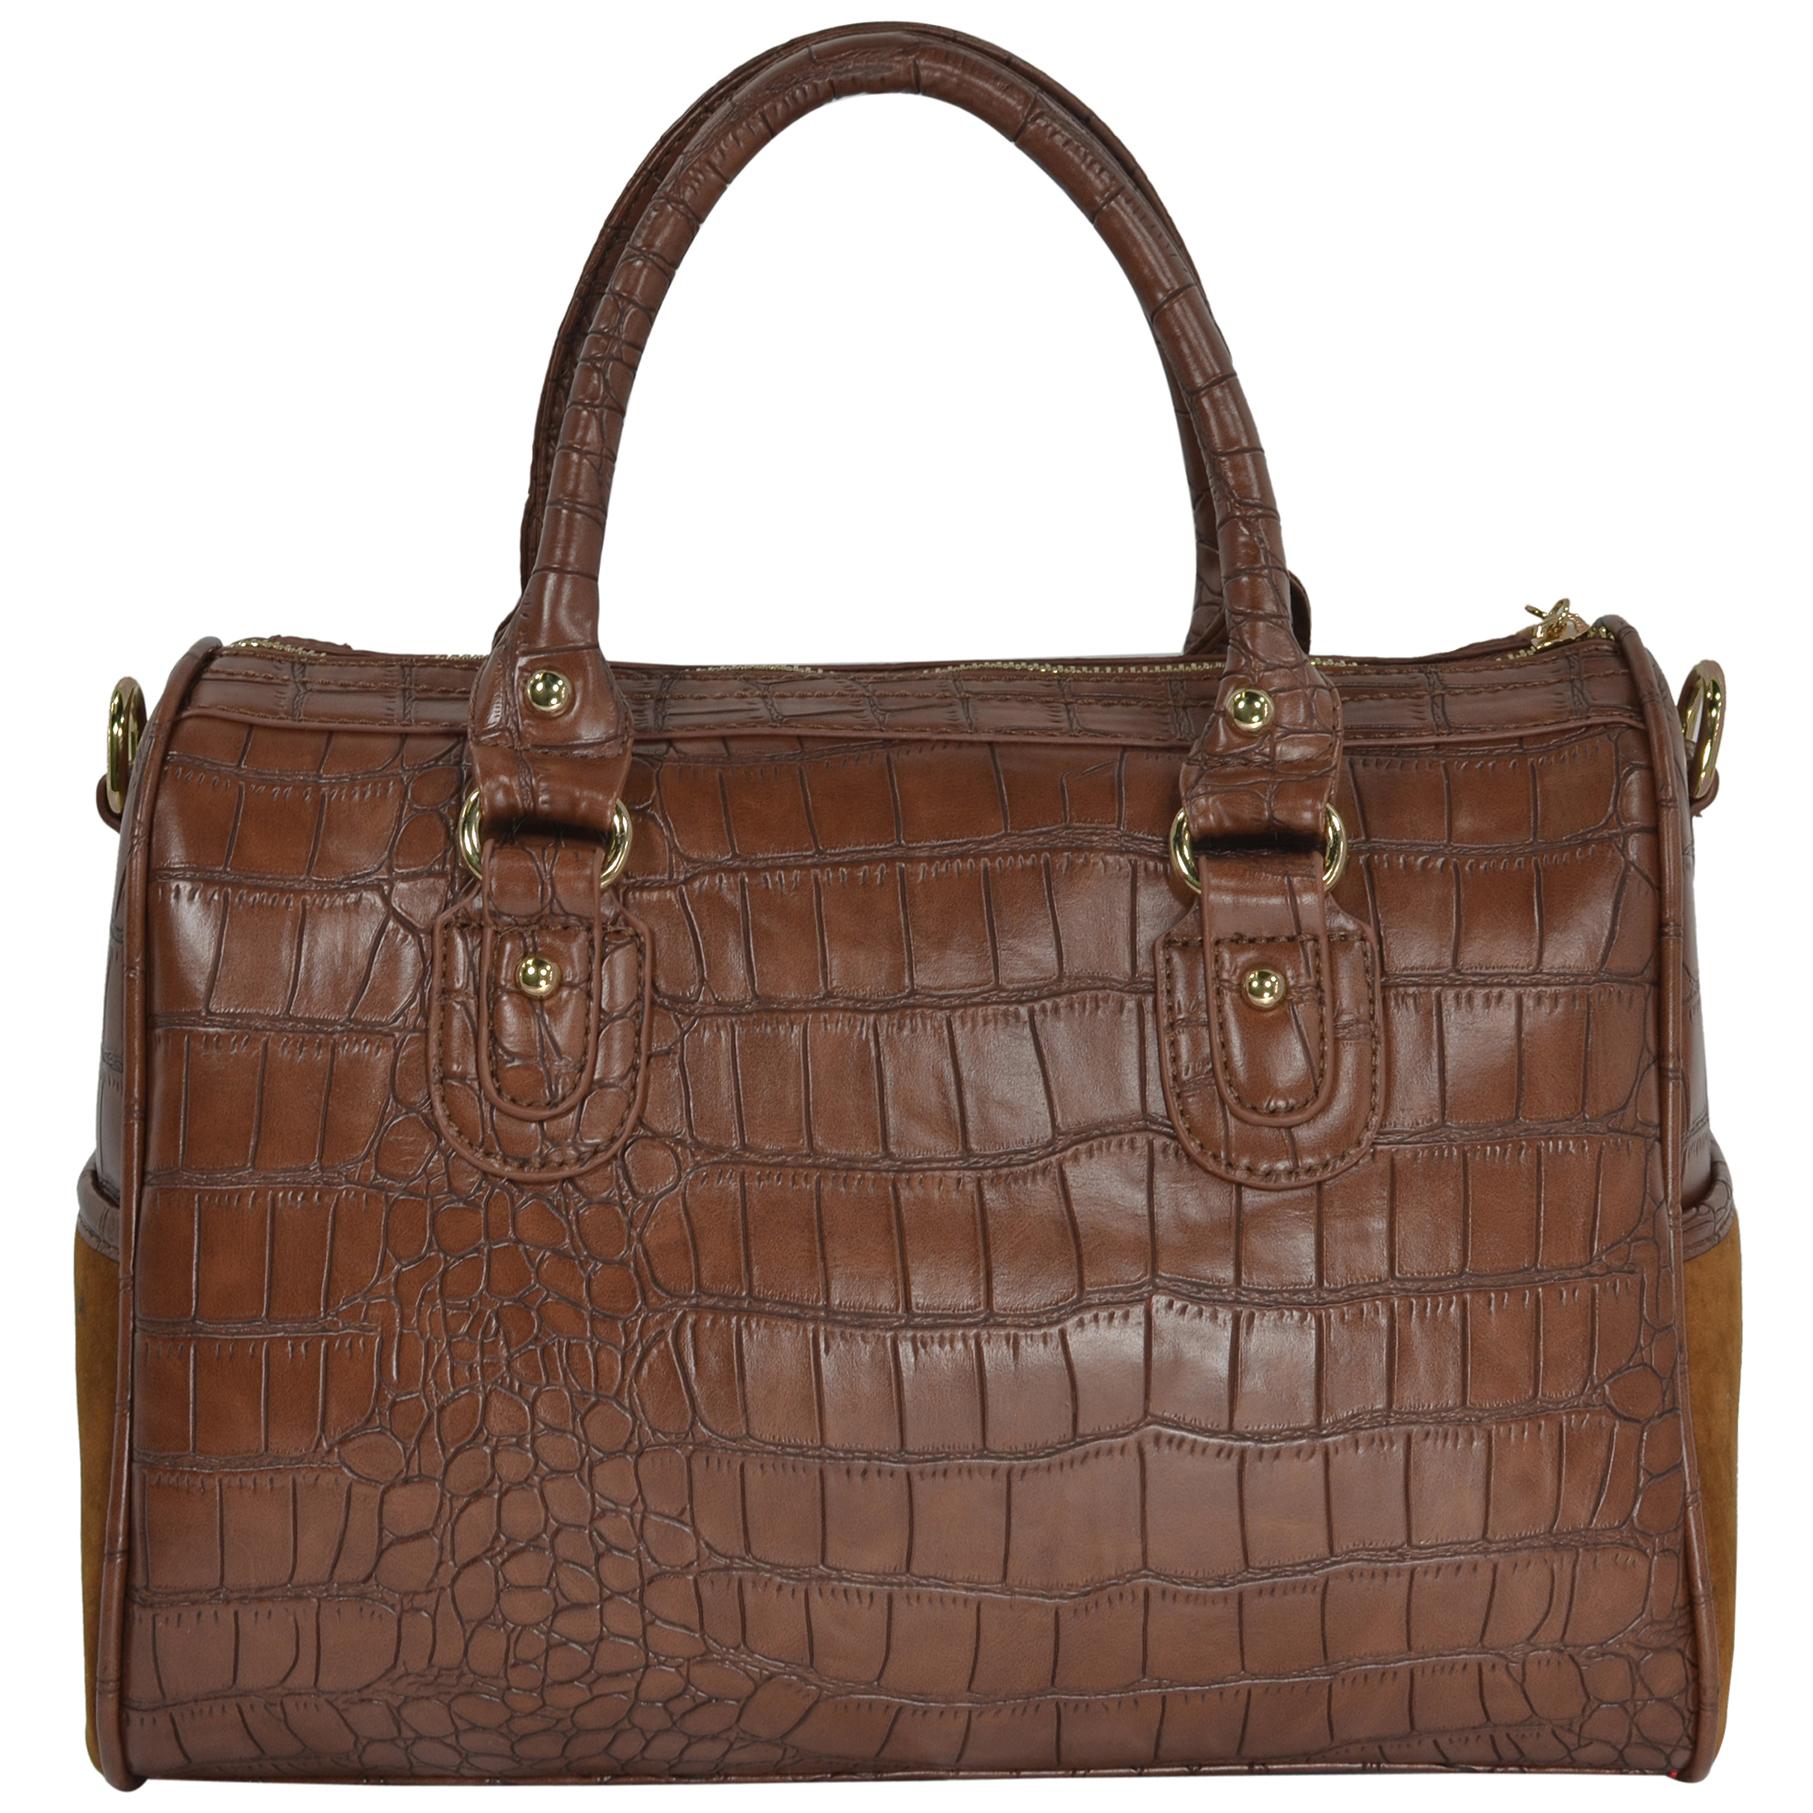 mg-collection-brandi-brown-bowler-handbag-tb-h0339brn-5.jpg